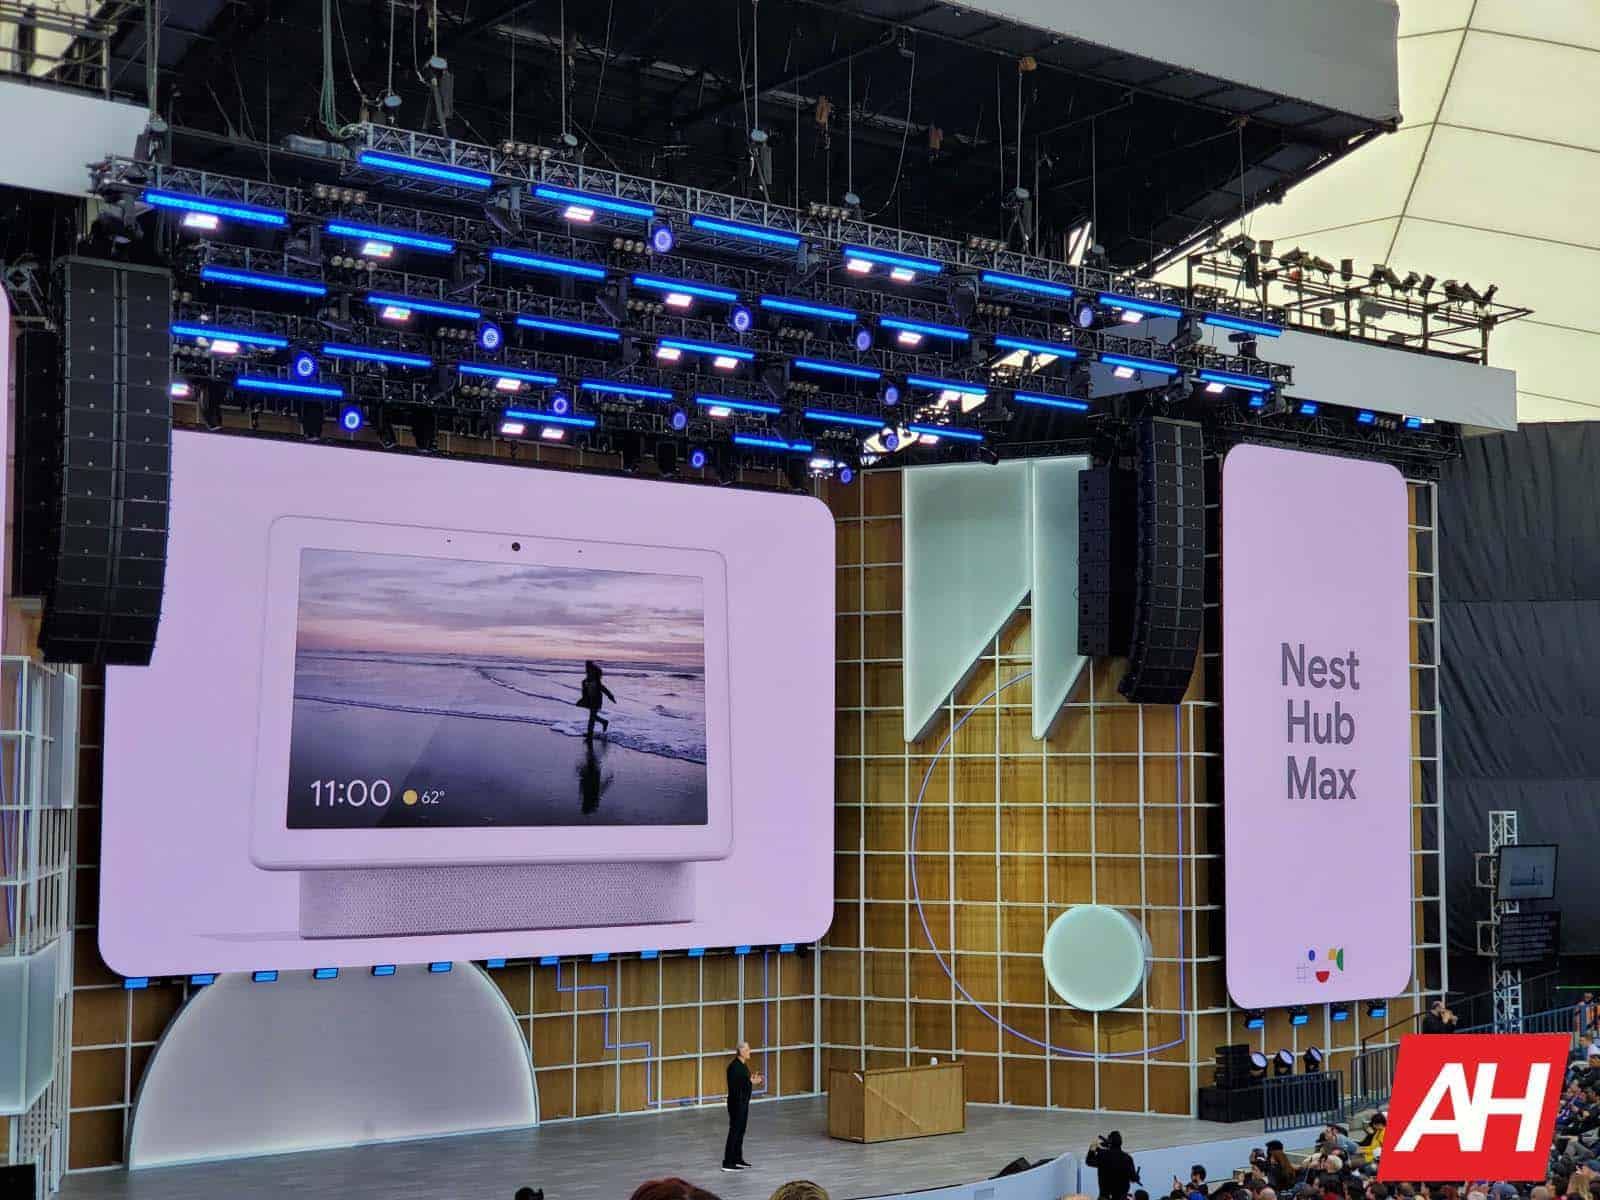 Google IO 2019 AH Keynote 02 24